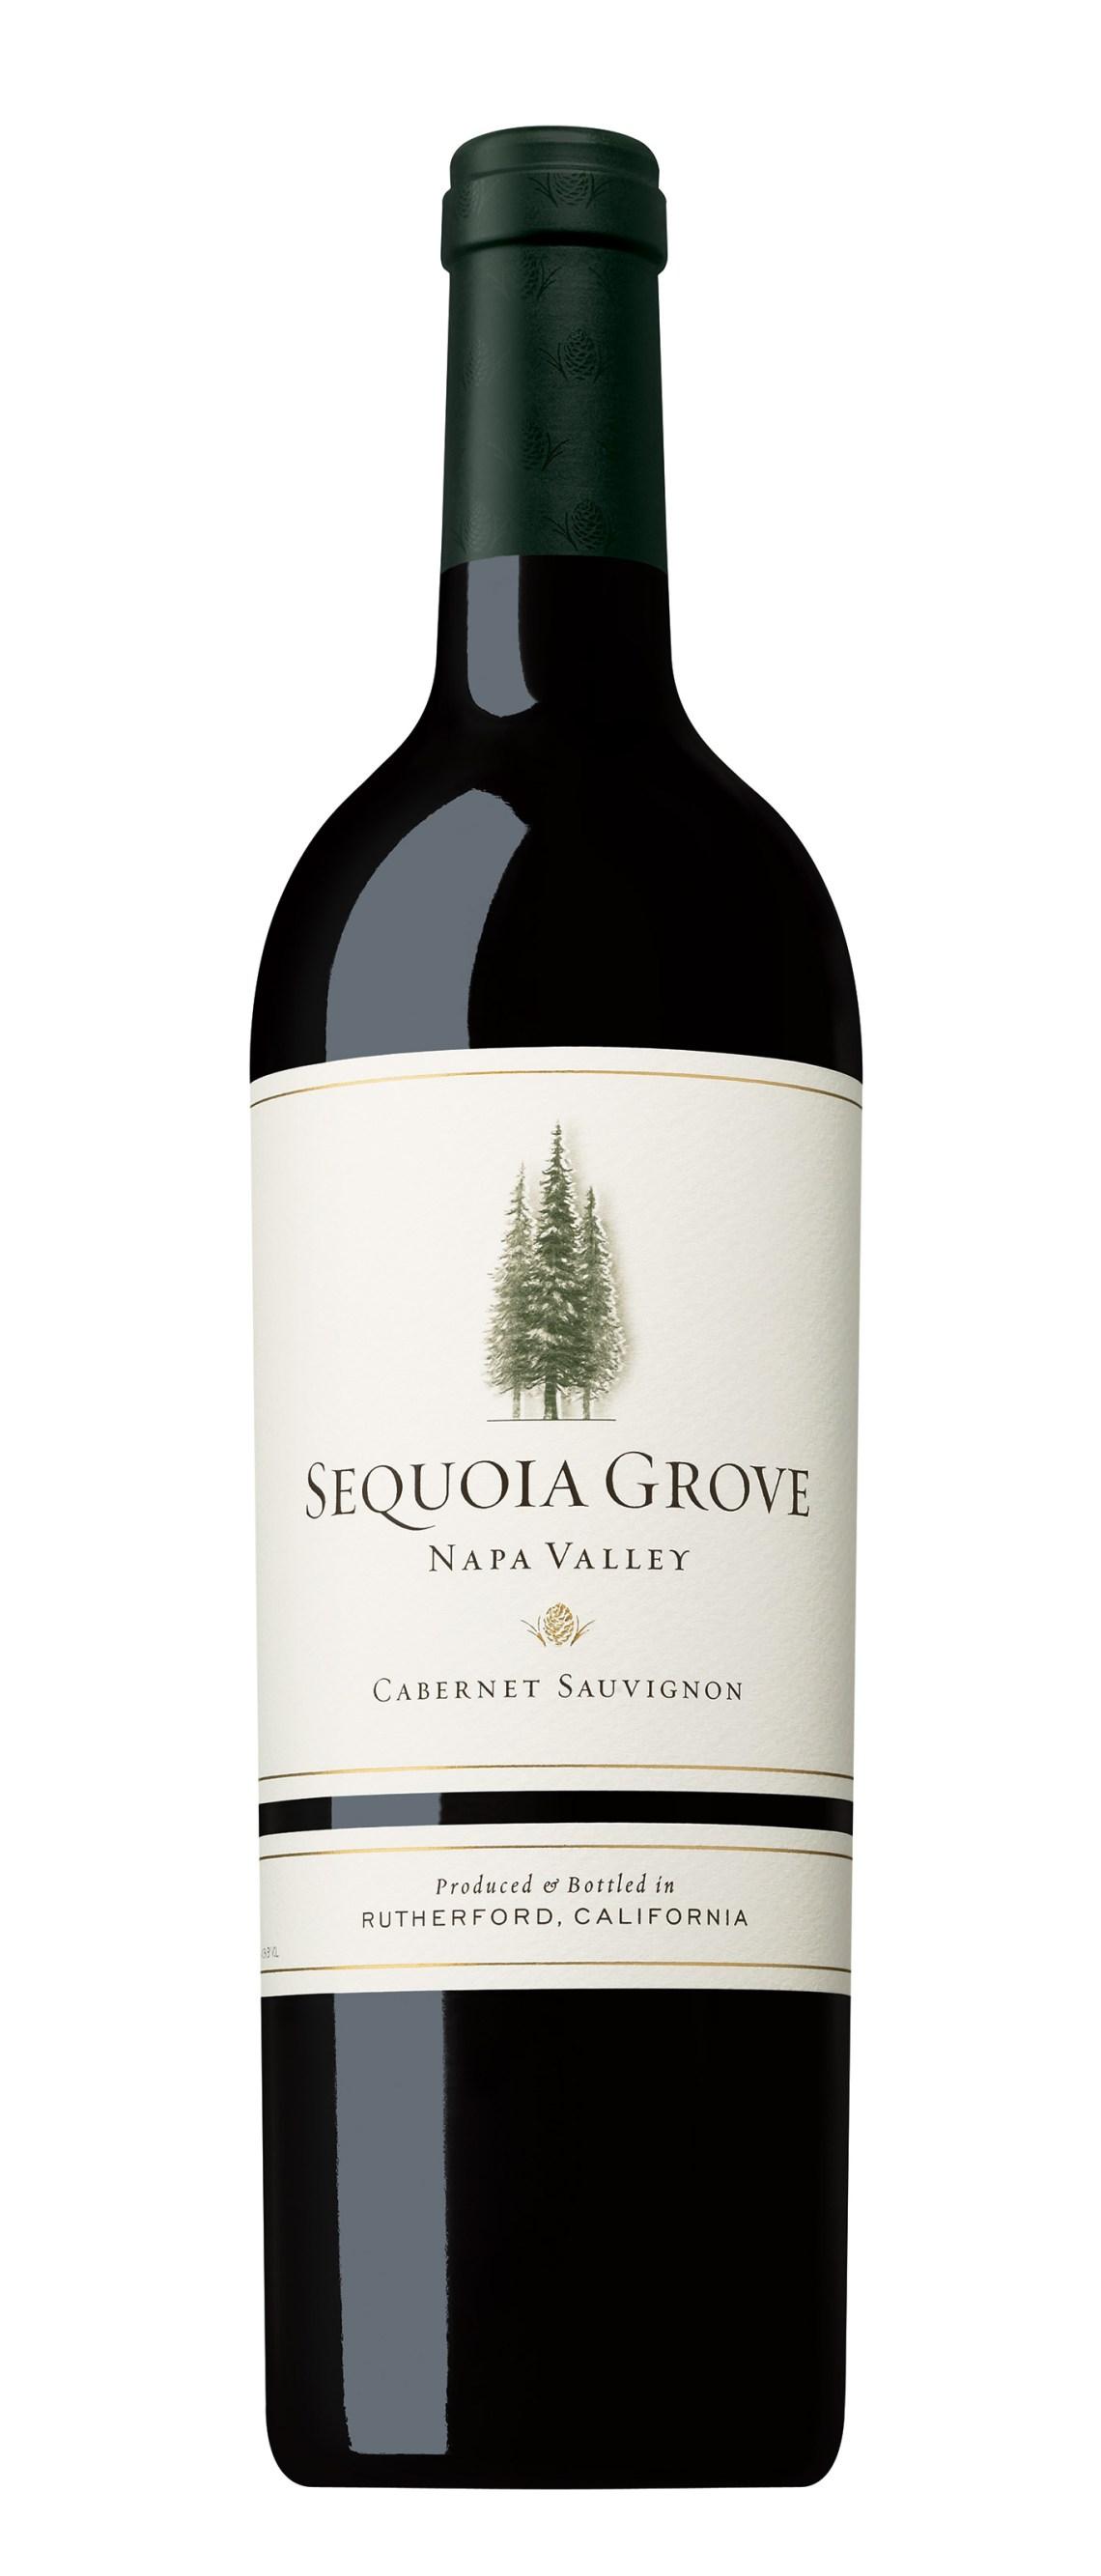 2011 Sequoia Grove Cabernet Sauvignon Napa Valley